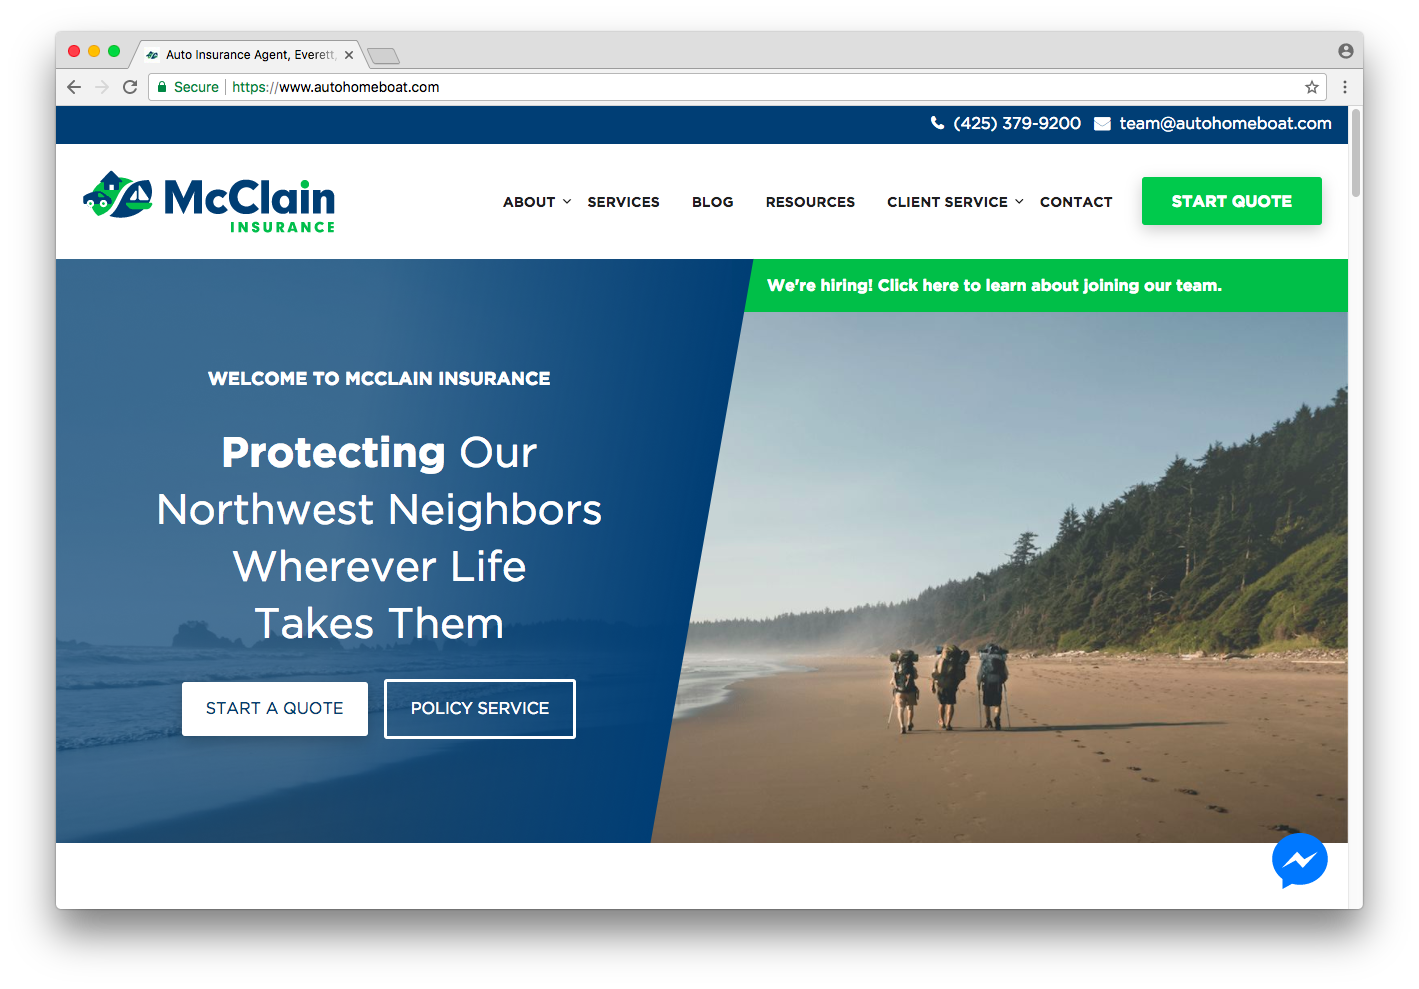 McClain Insurance